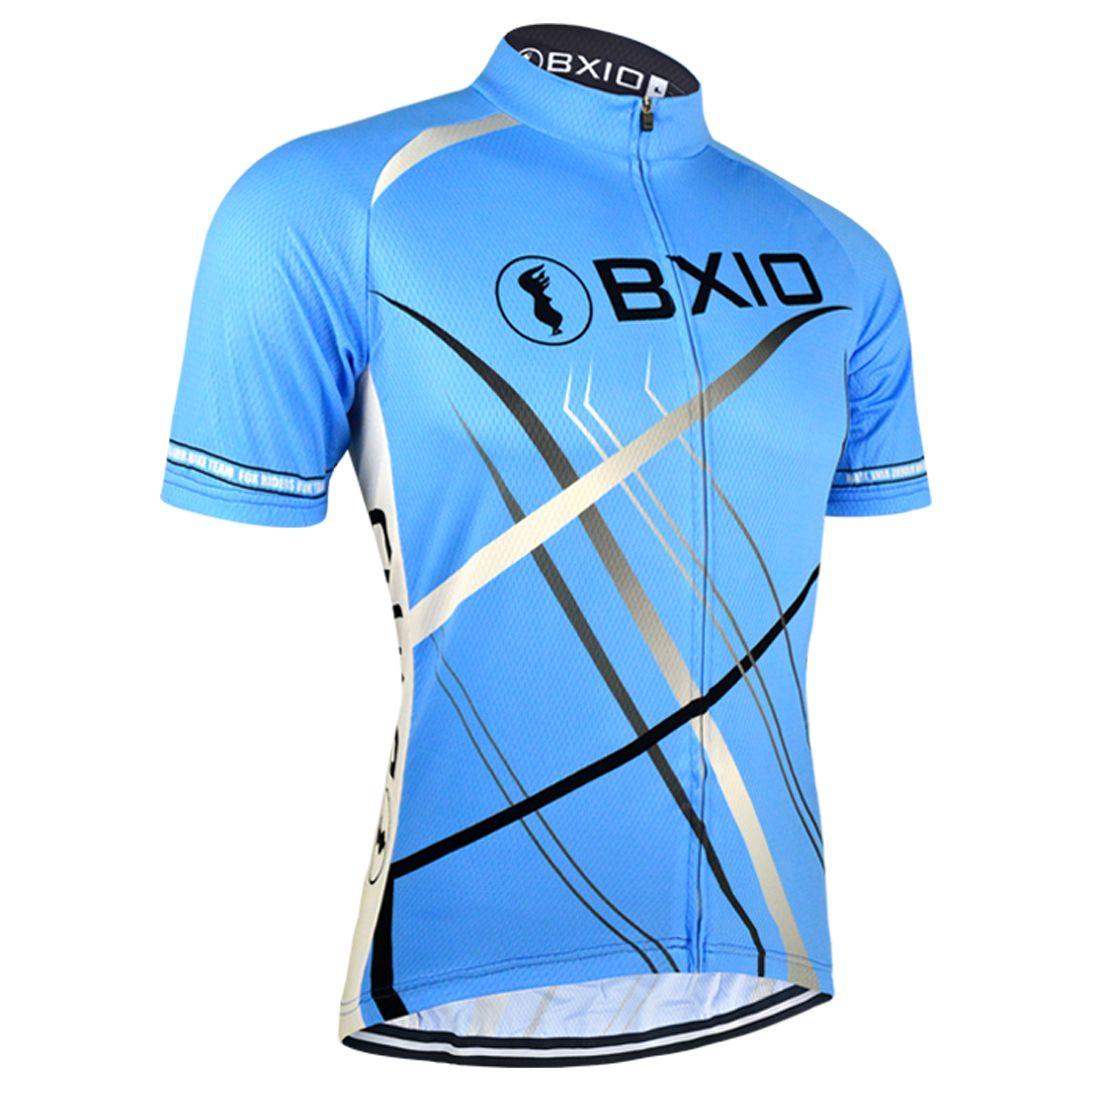 Cycling 2019 Women Cycling Jersey Long Sleeve Mtb Bicycle Clothing Ciclismo Maillot Road Riding Shirt Bike Cycling Clothing Black Elk